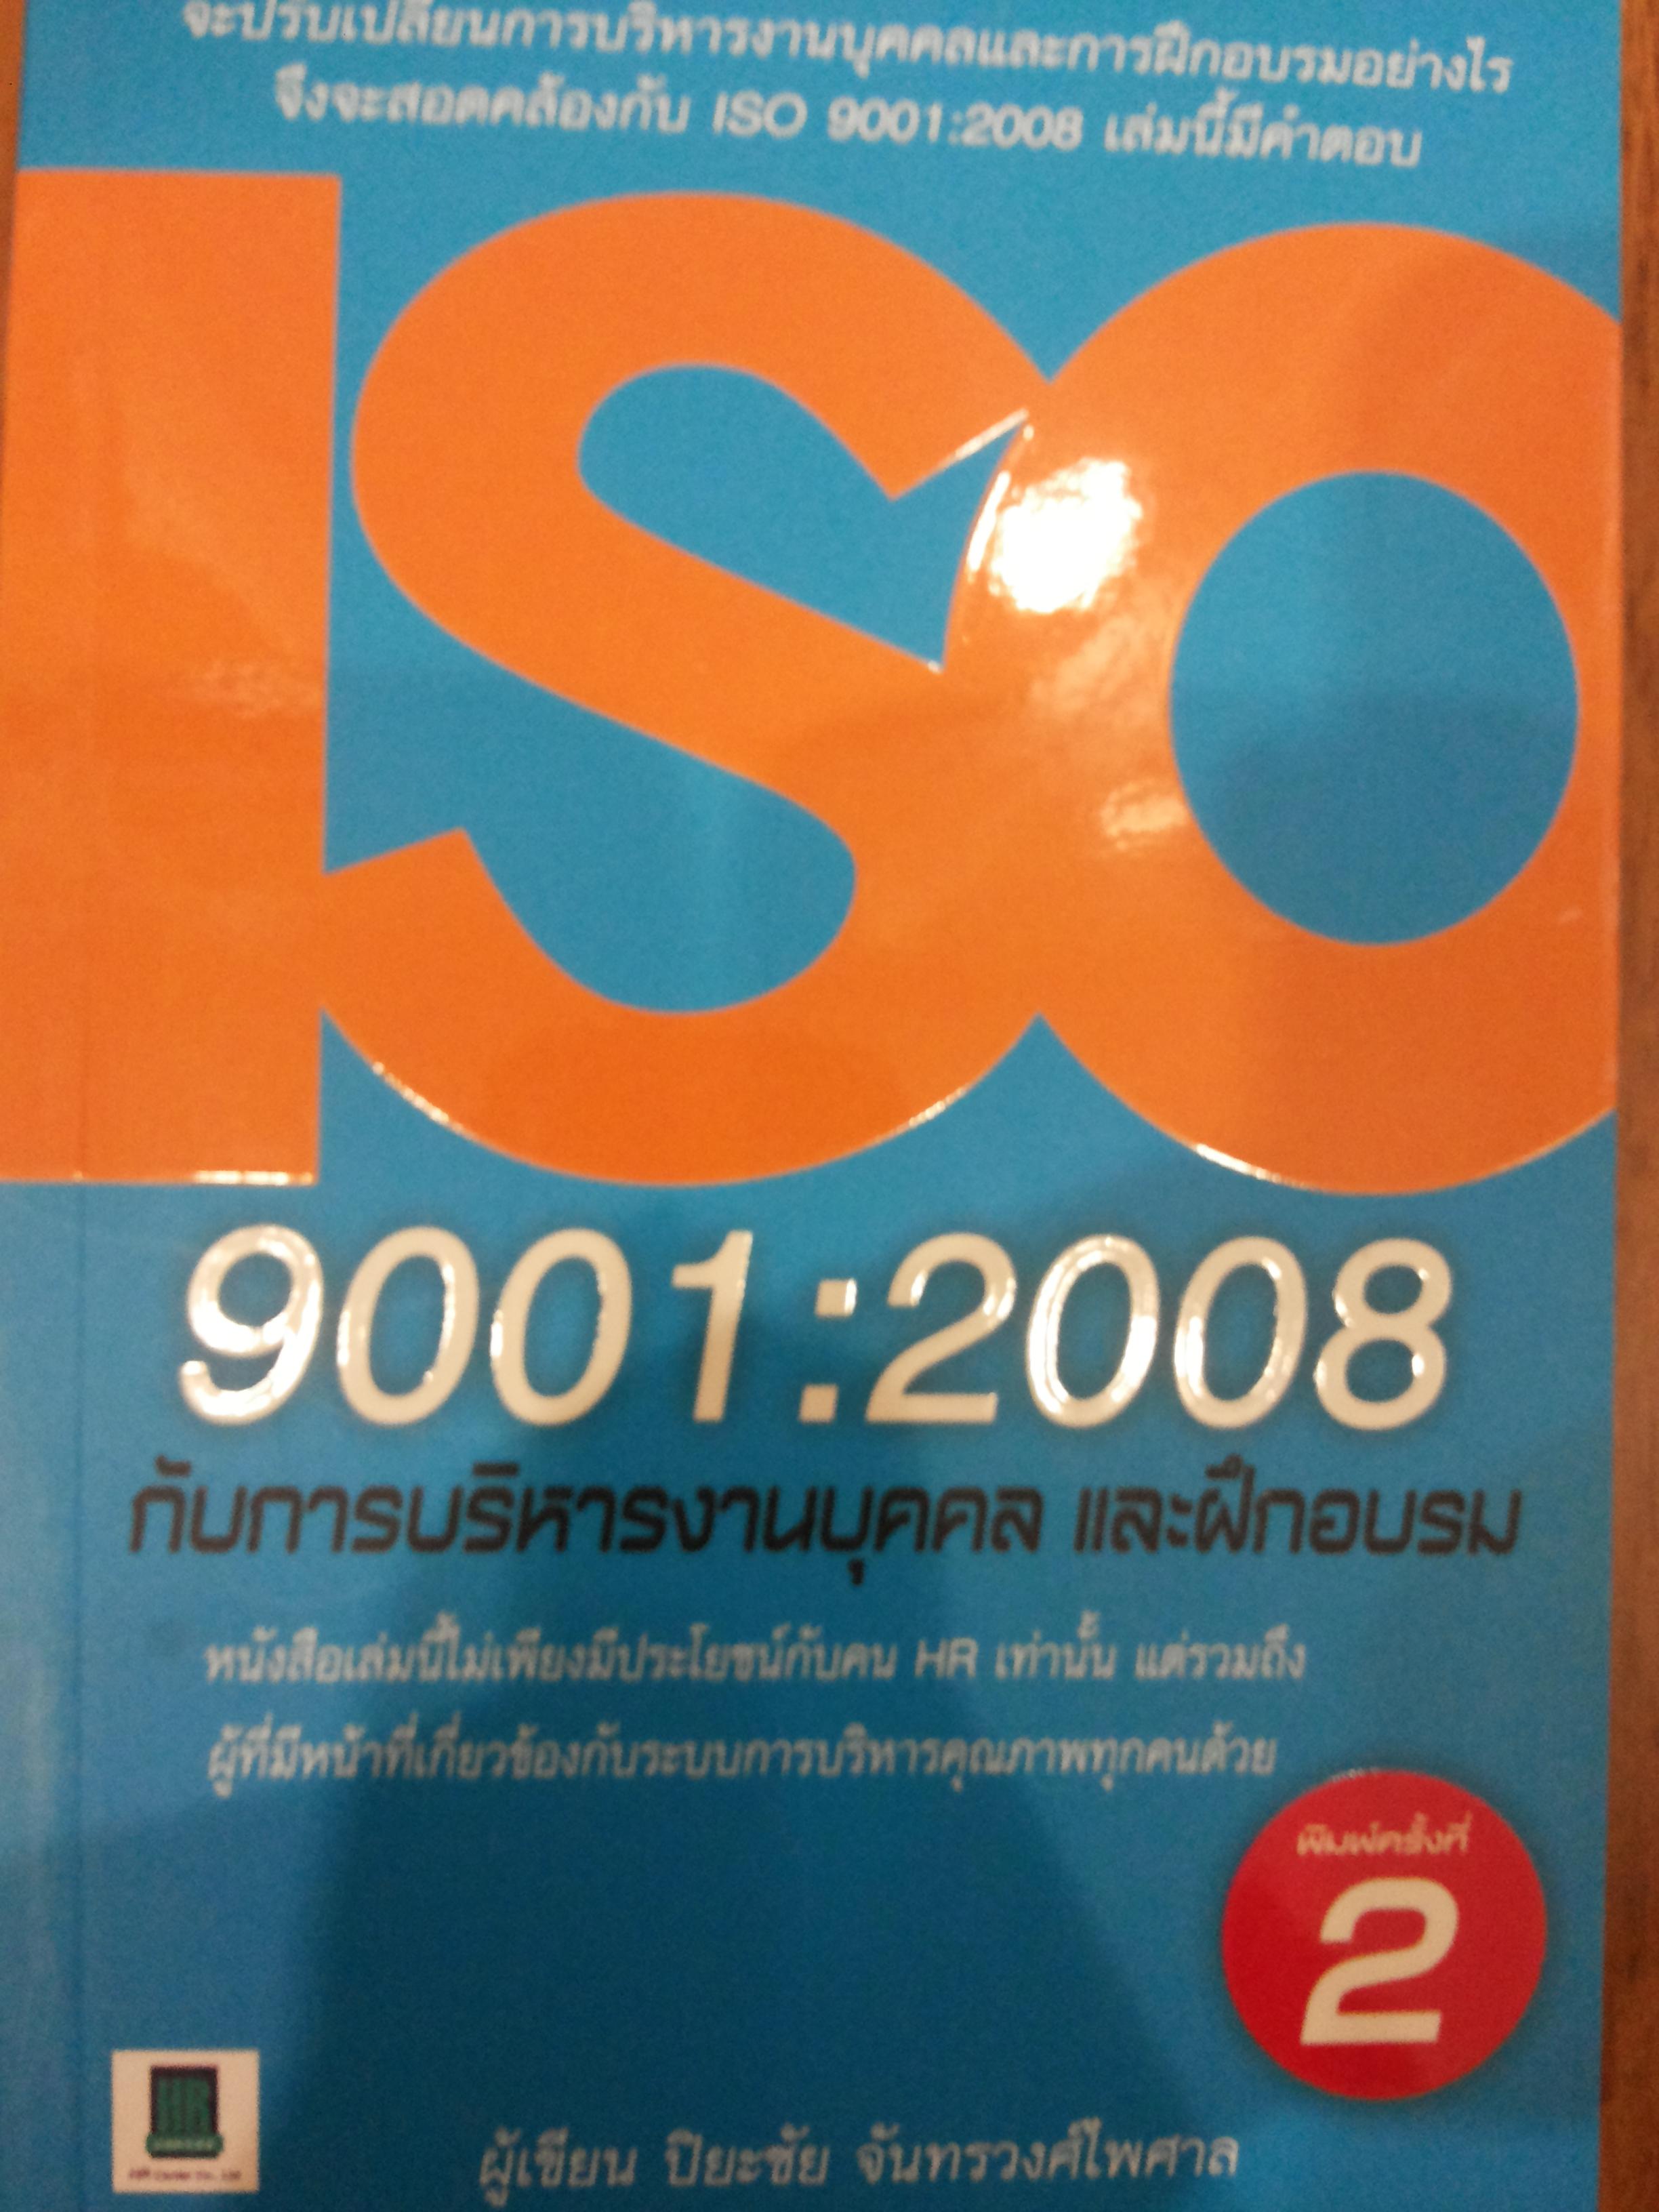 ISO9001:2008 กับการบริหารงานบุคคล และฝึกอบรม